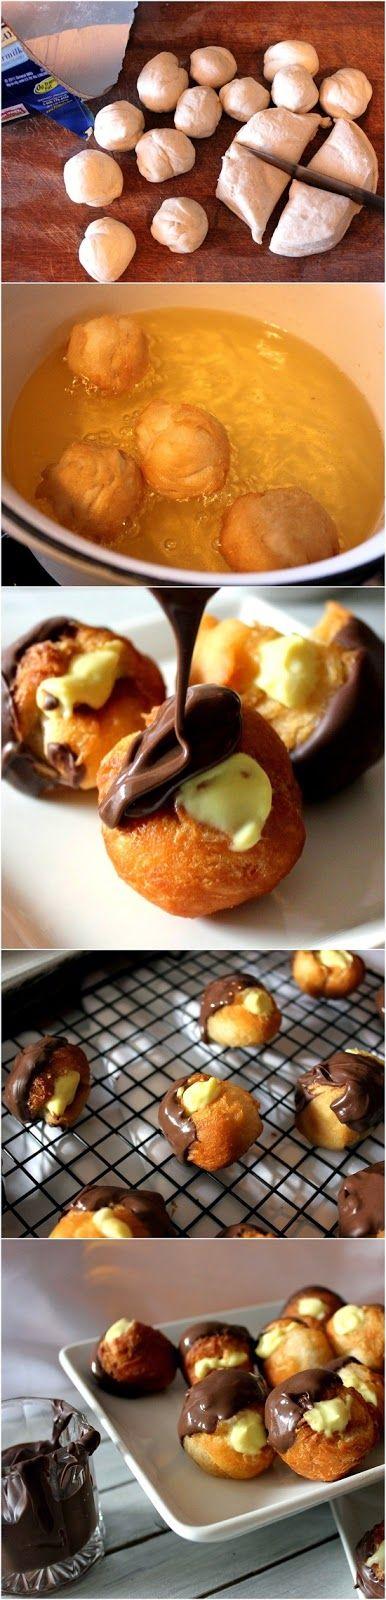 How To Make Boston Cream Doughnut Holes